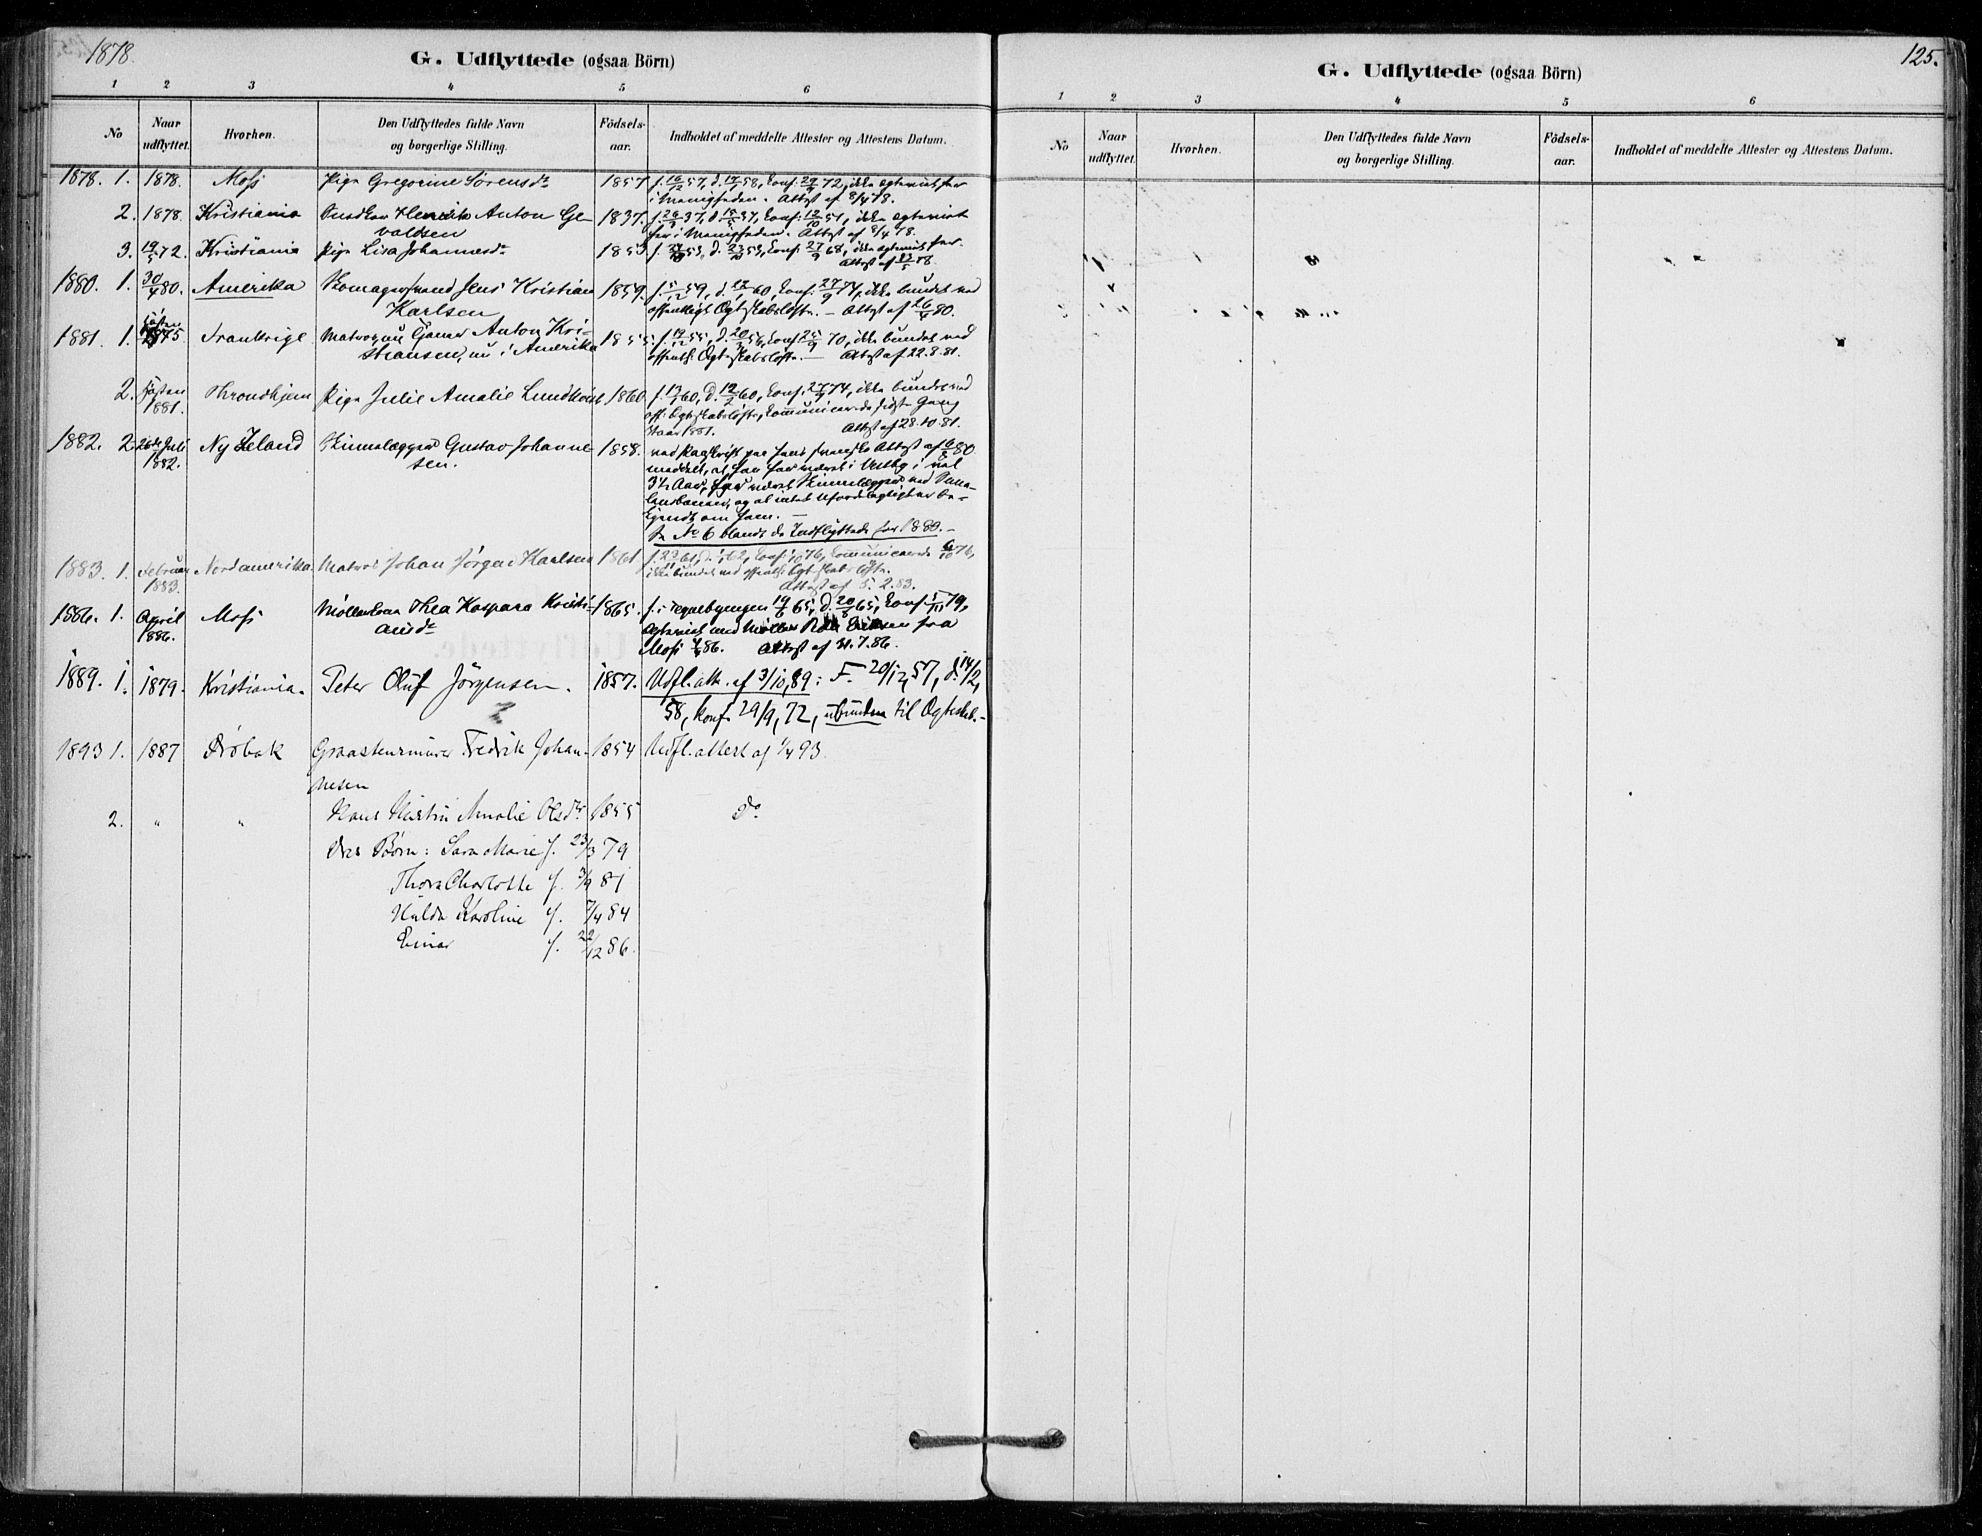 SAO, Vestby prestekontor Kirkebøker, F/Fe/L0001: Ministerialbok nr. V 1, 1878-1931, s. 125